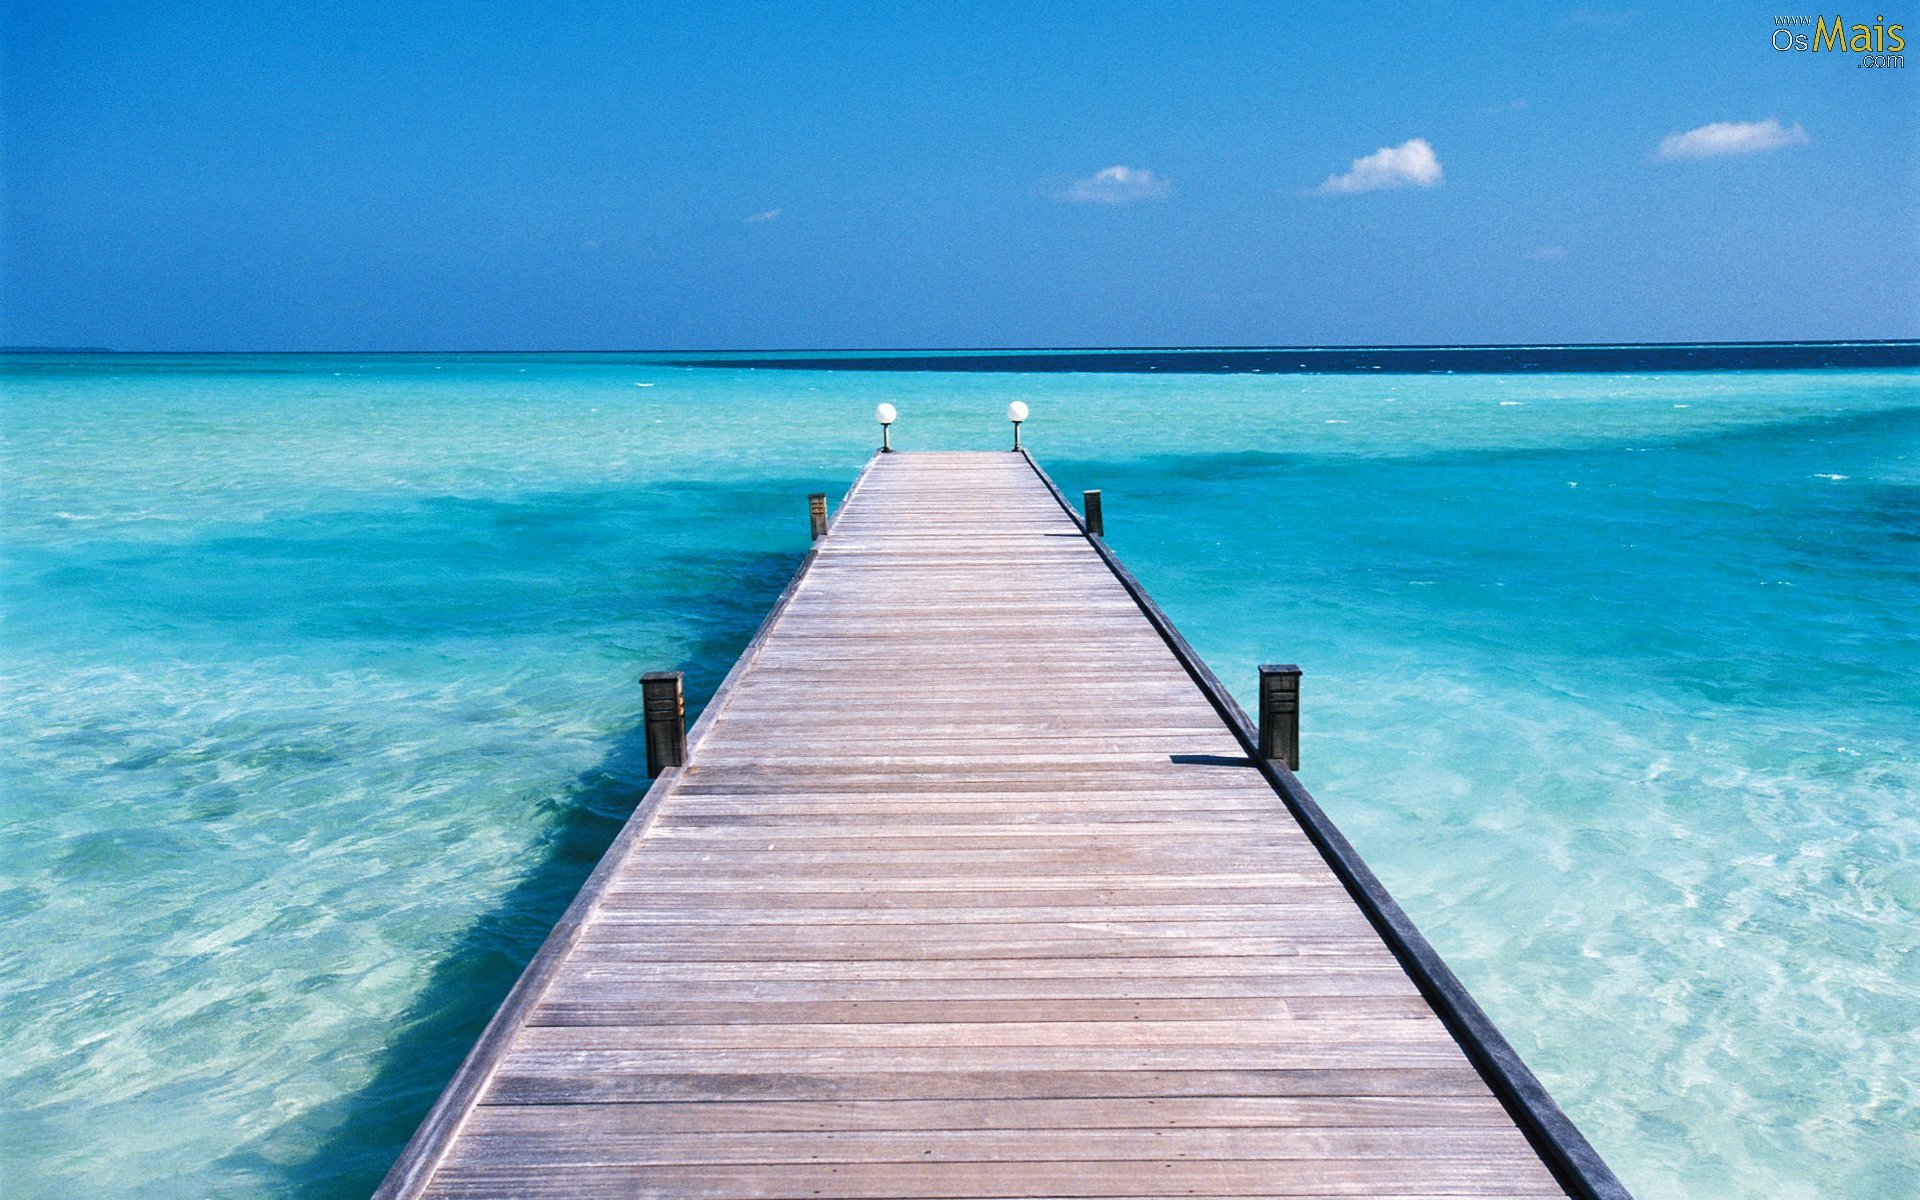 Pier In The Clear Blue Sea - WallDevil